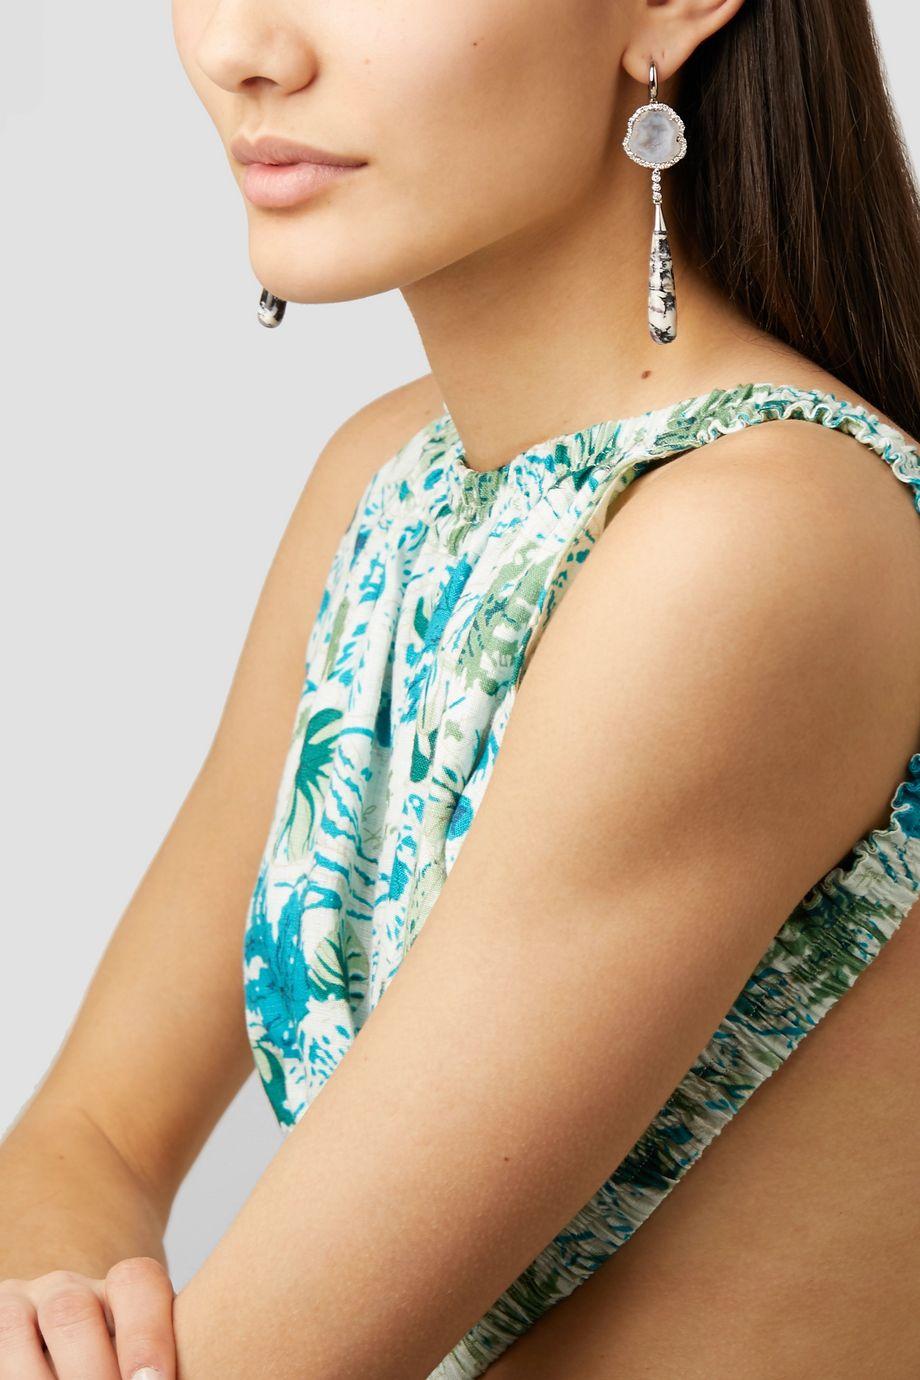 Kimberly McDonald + NET SUSTAIN 18-karat white gold multi-stone earrings